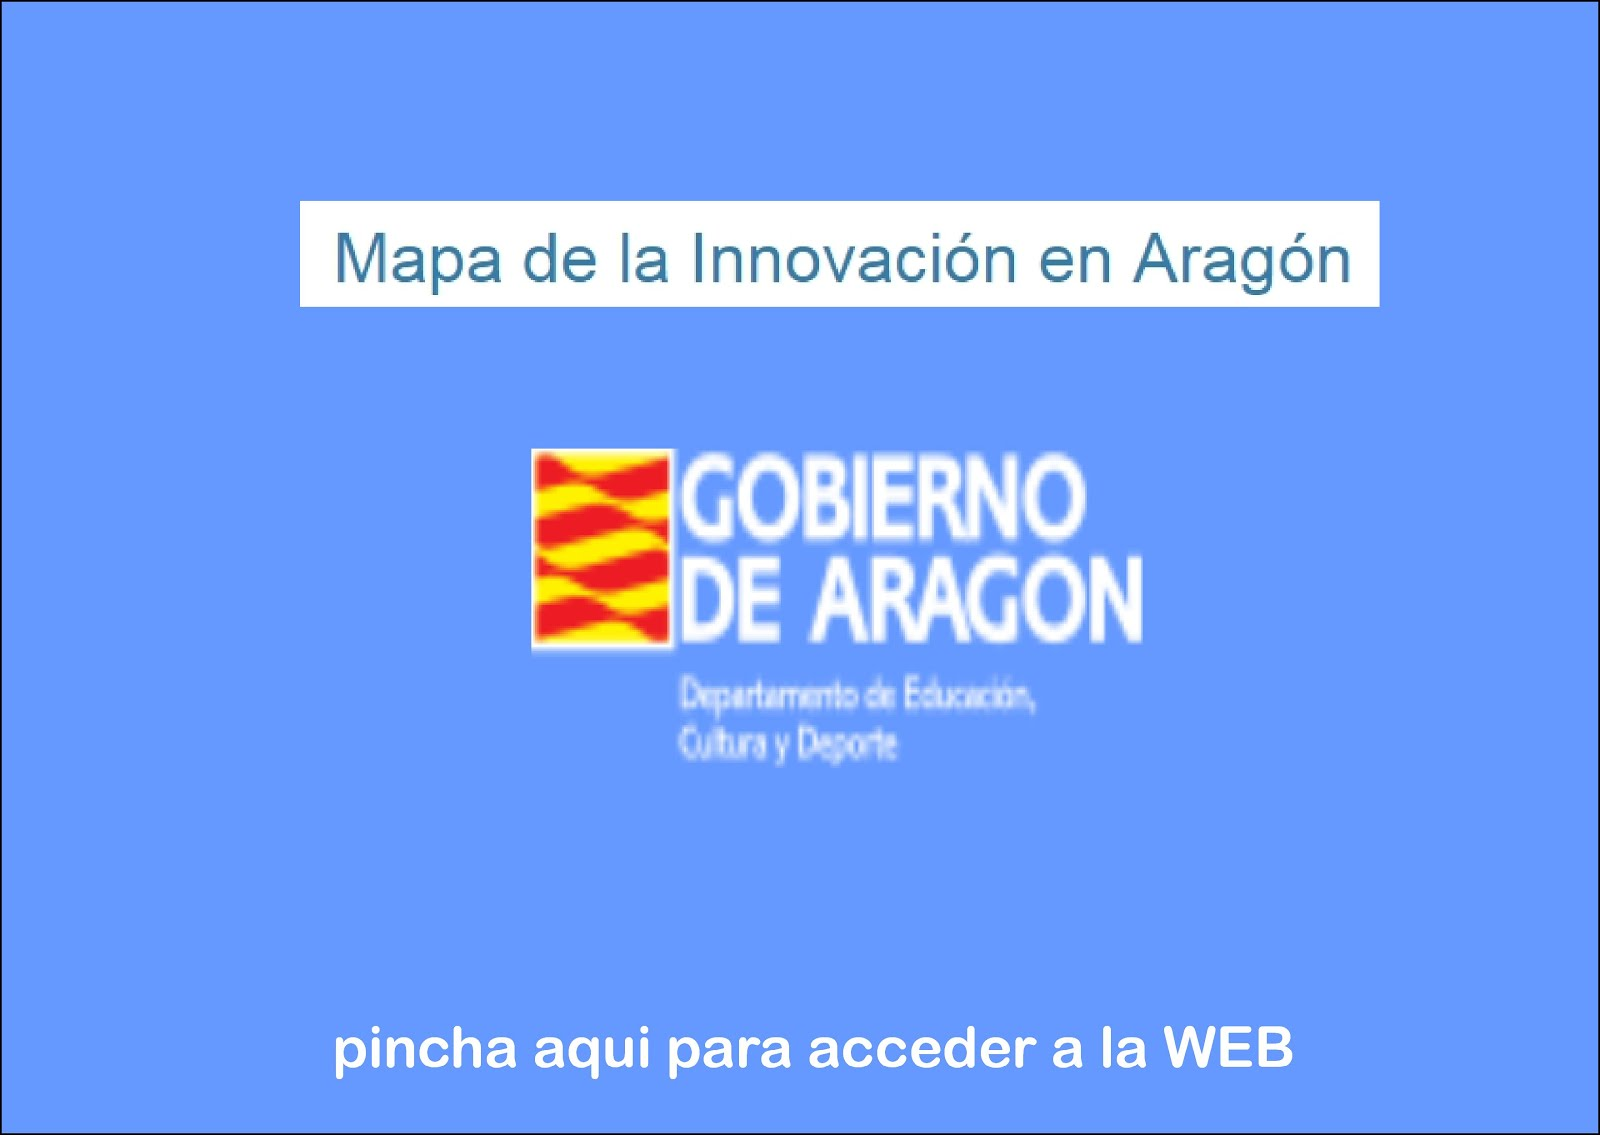 MAPA INNOVACIÓN DE ARAGÓN